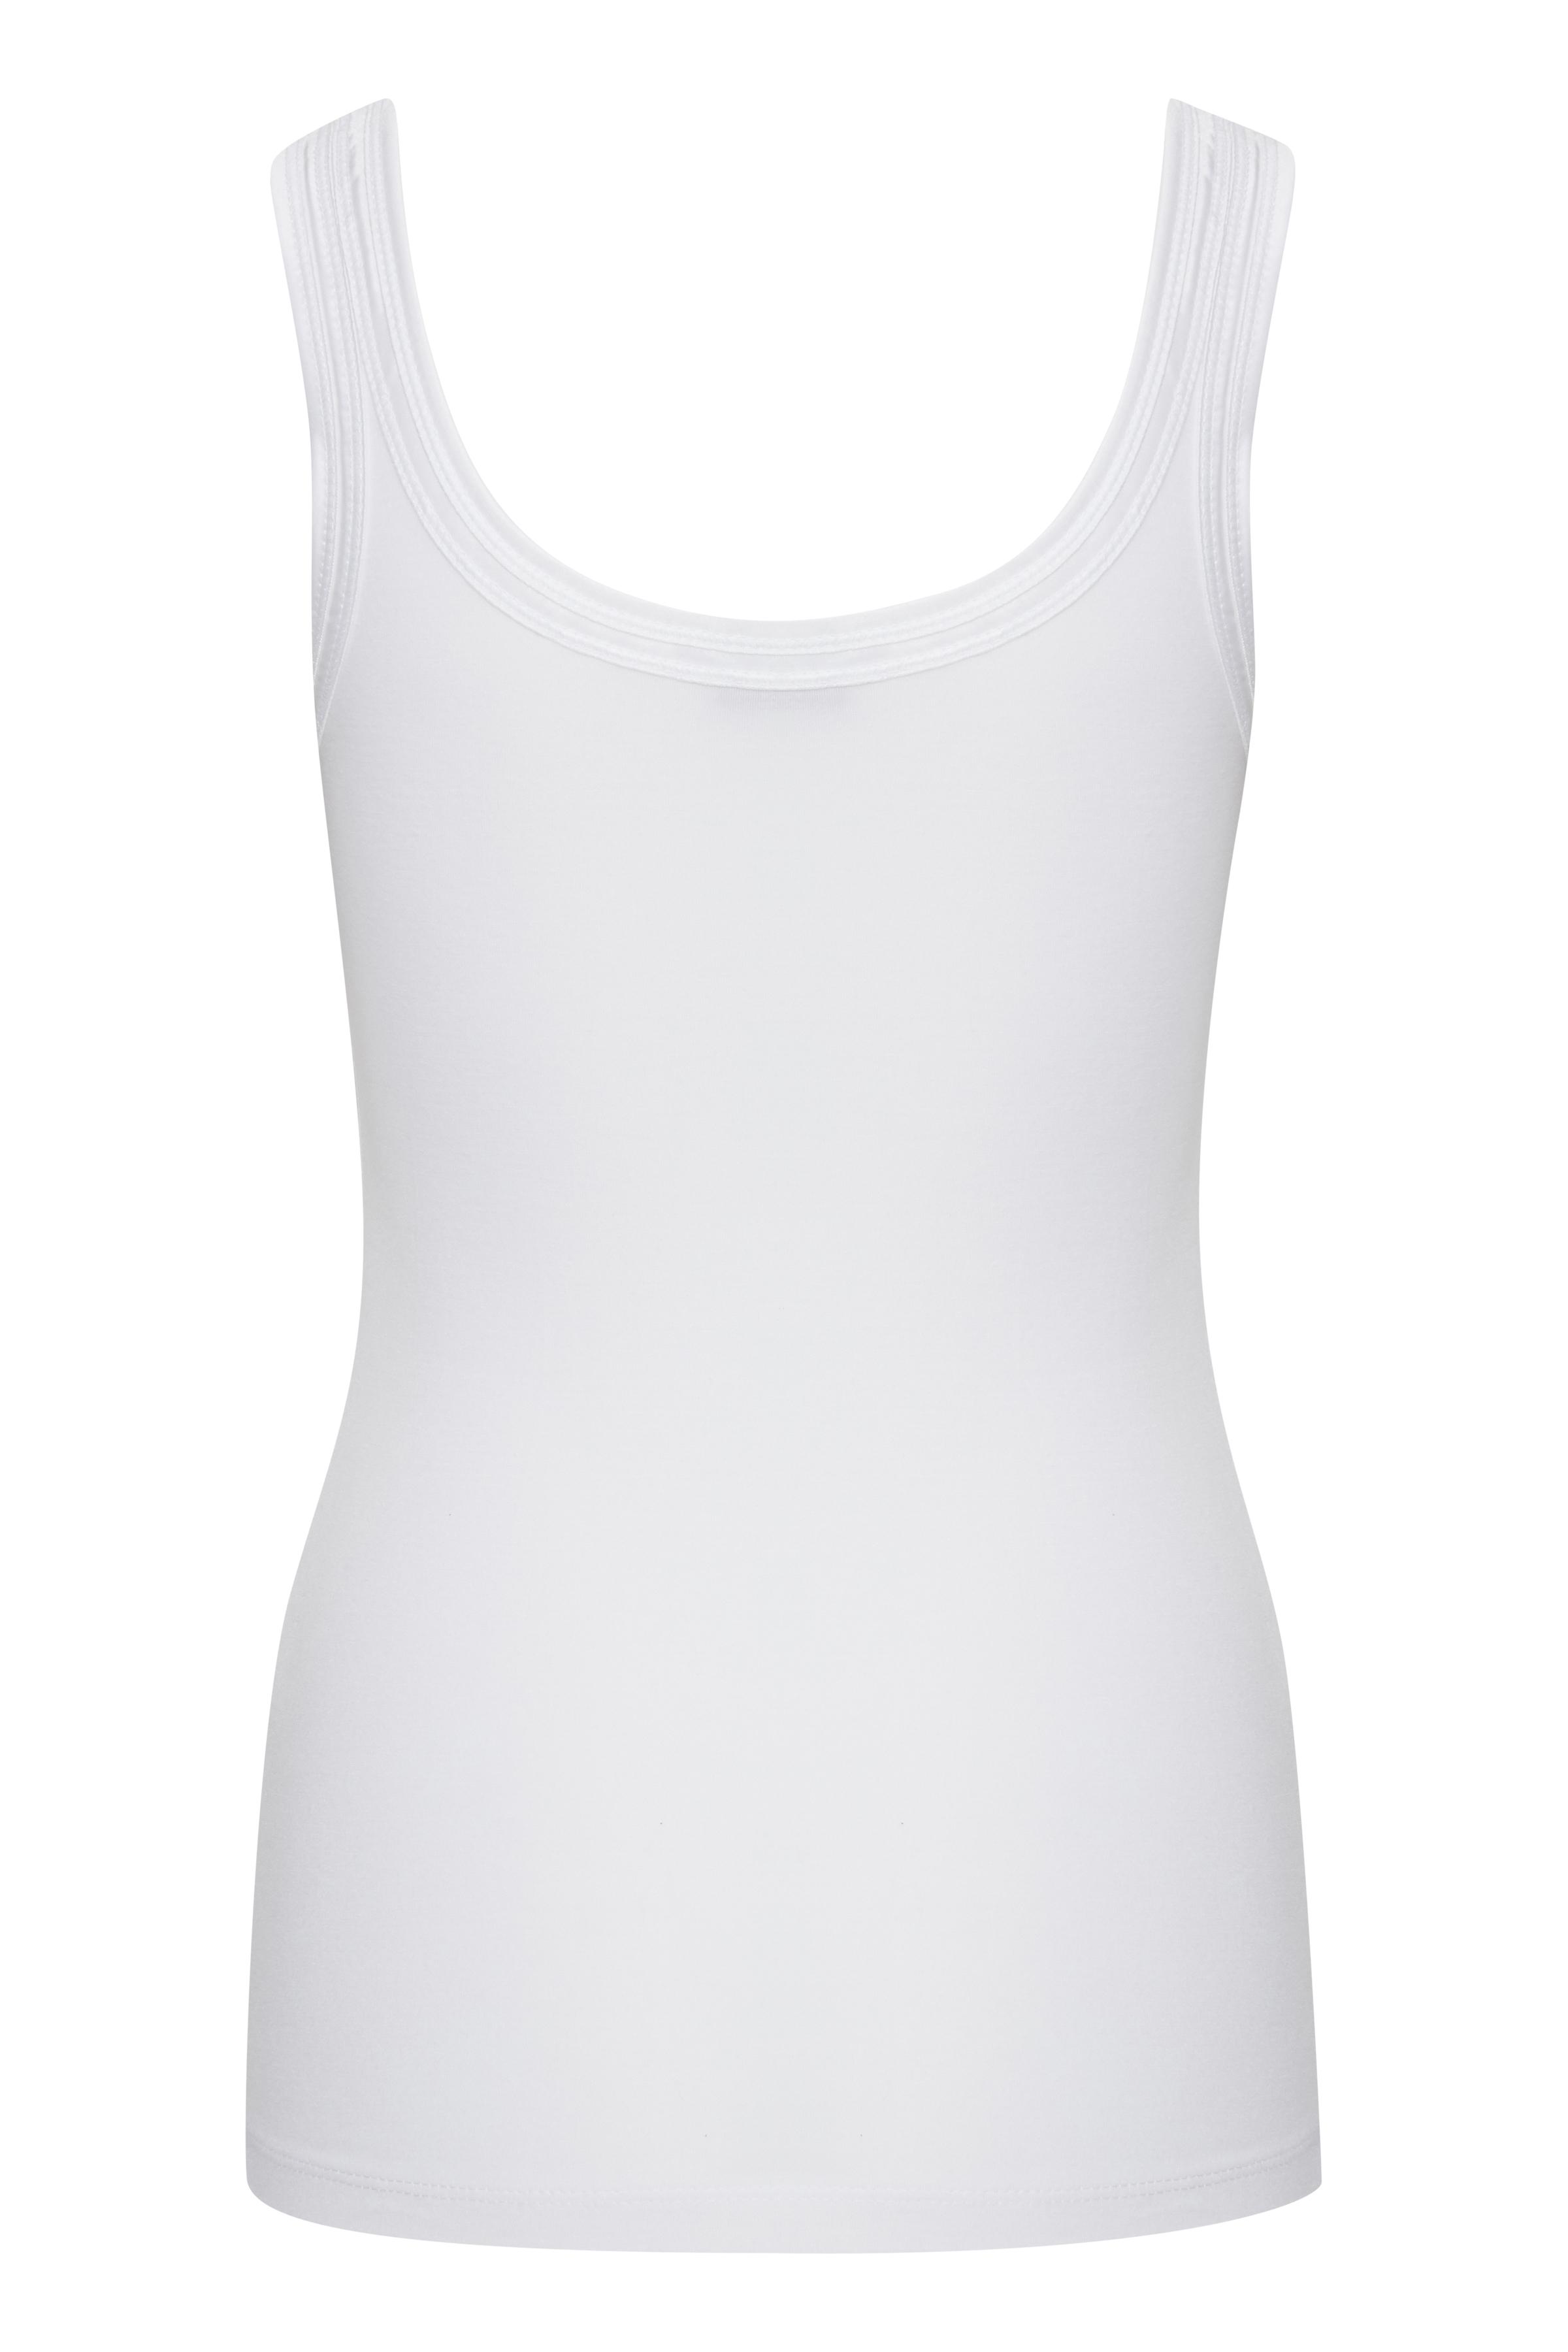 White Jerseytop – Køb White Jerseytop fra str. XS-XXL her